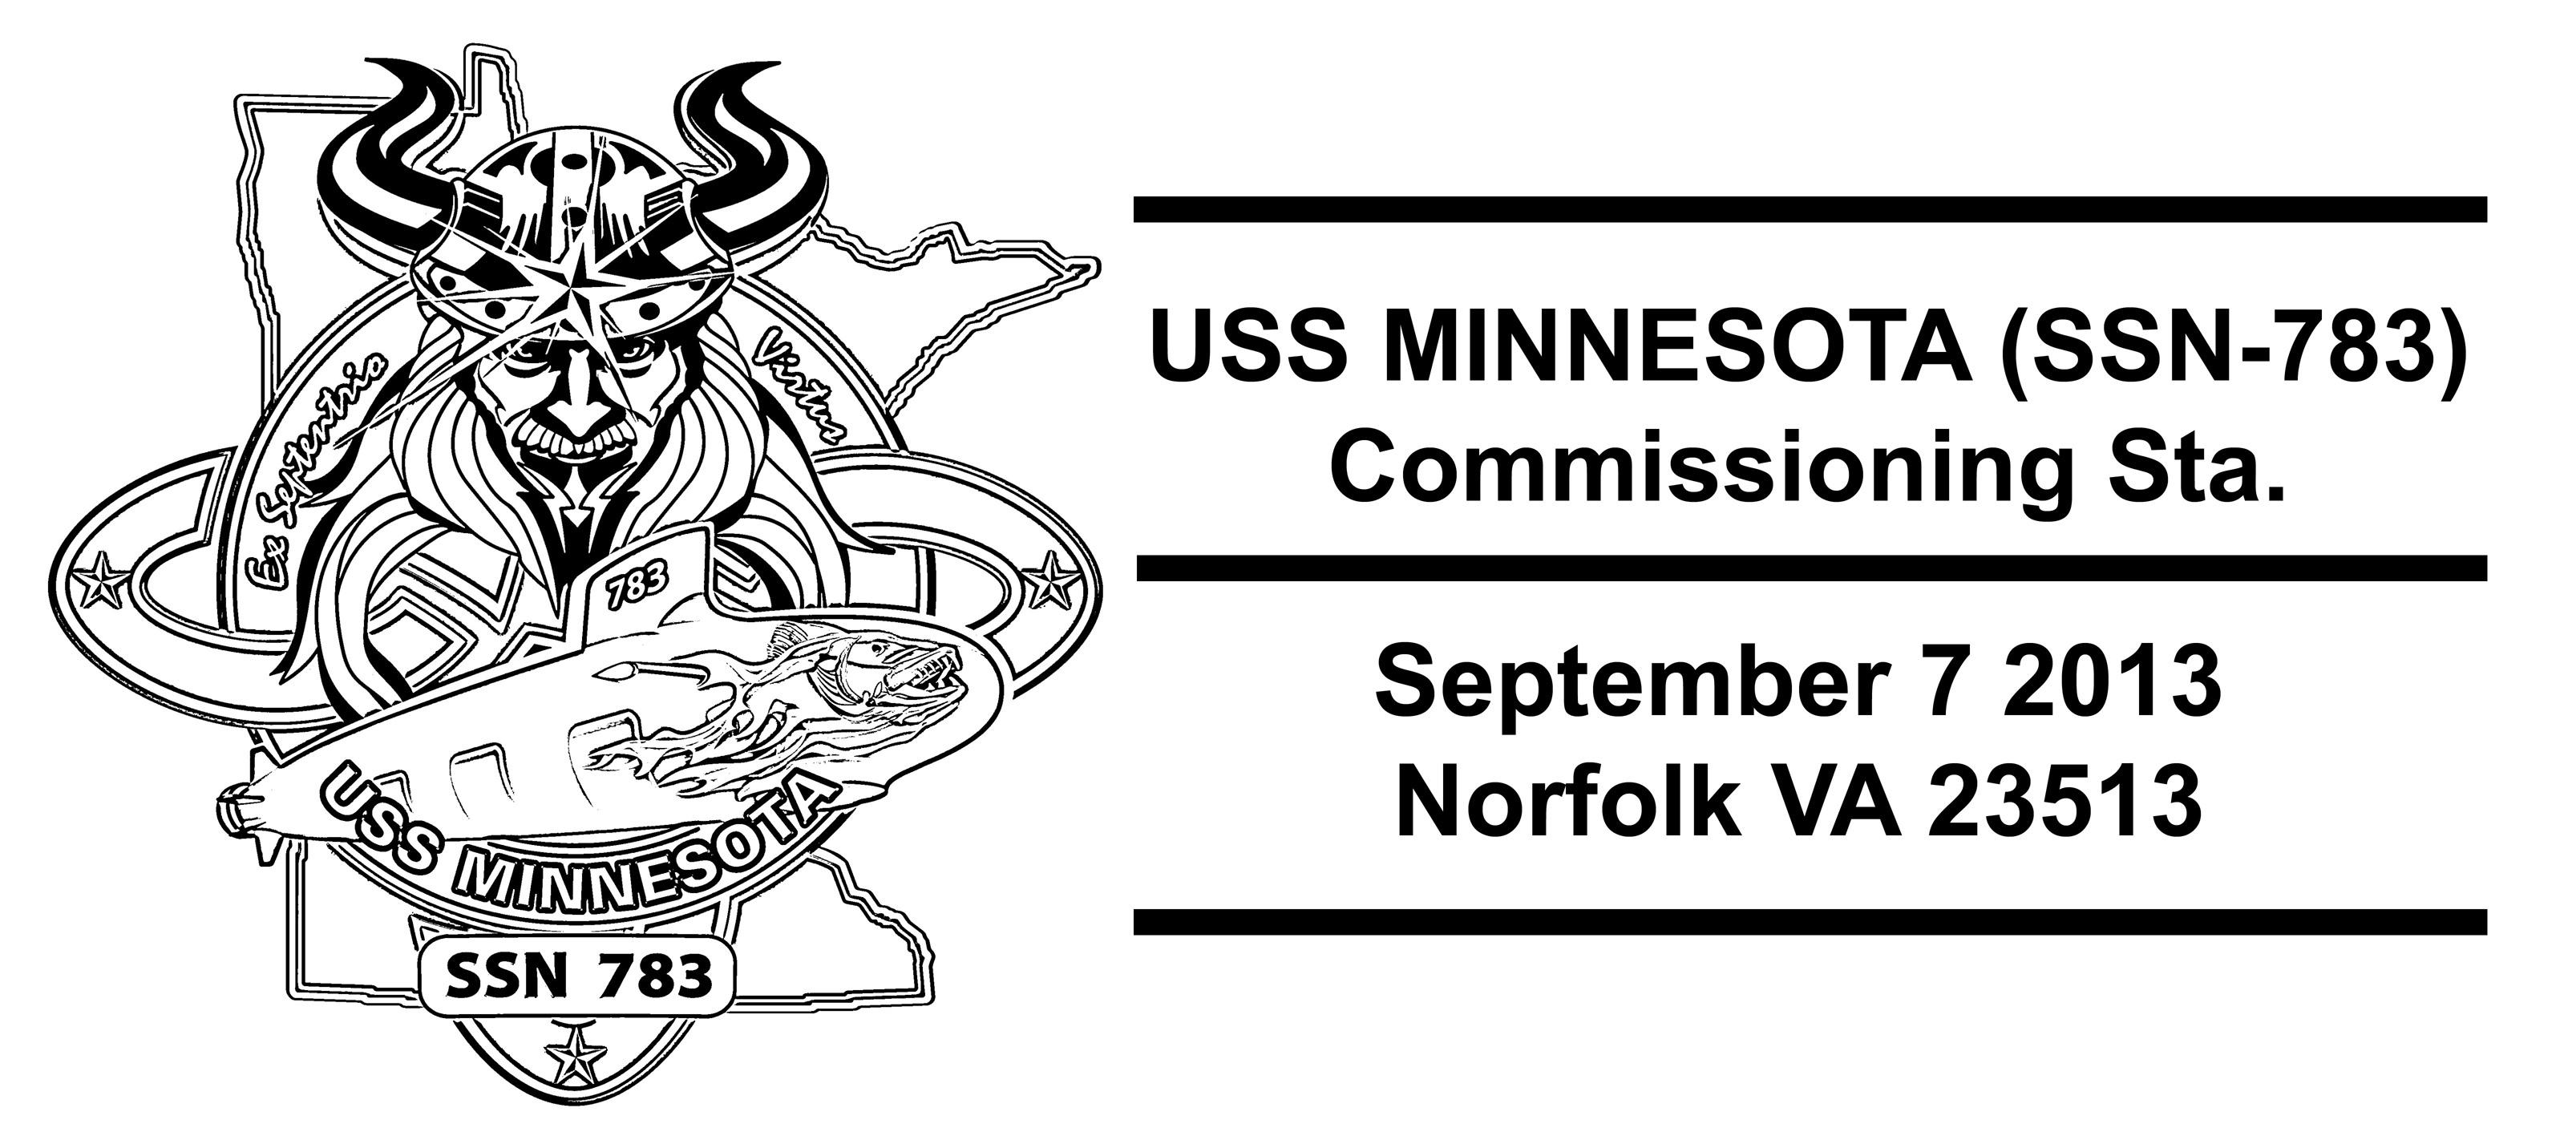 Sonderpoststempel USS MINNESOTA SSN-783 CommissioningGrafik: Wolfgang Hechler